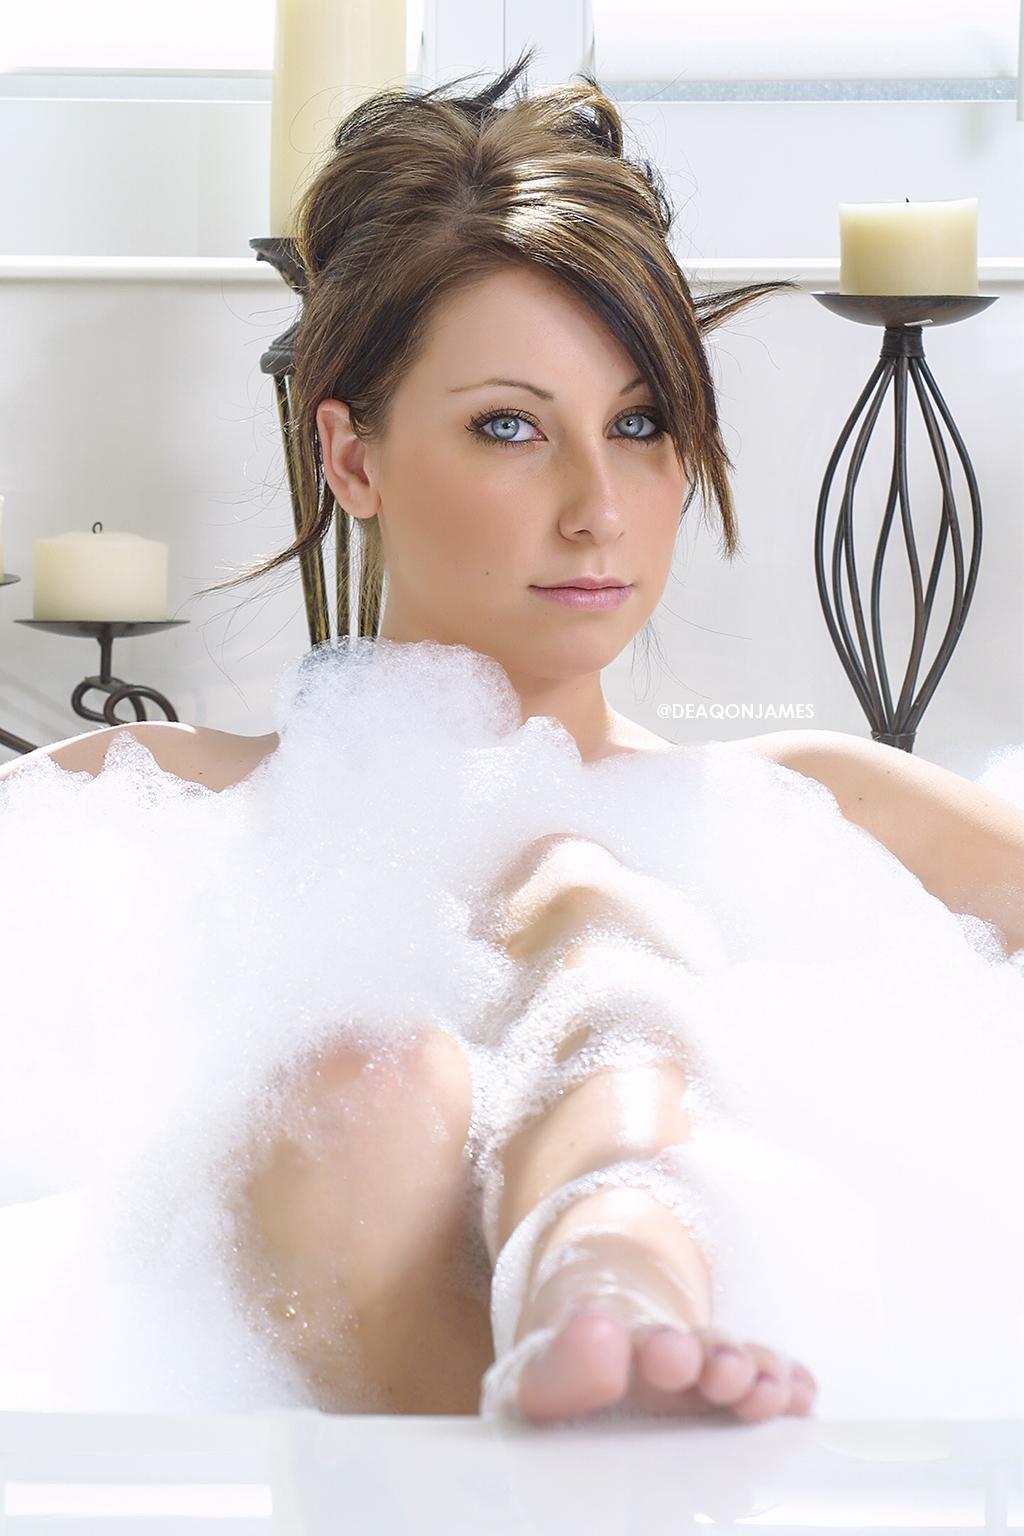 DJTalDiva - Rikki Riegler